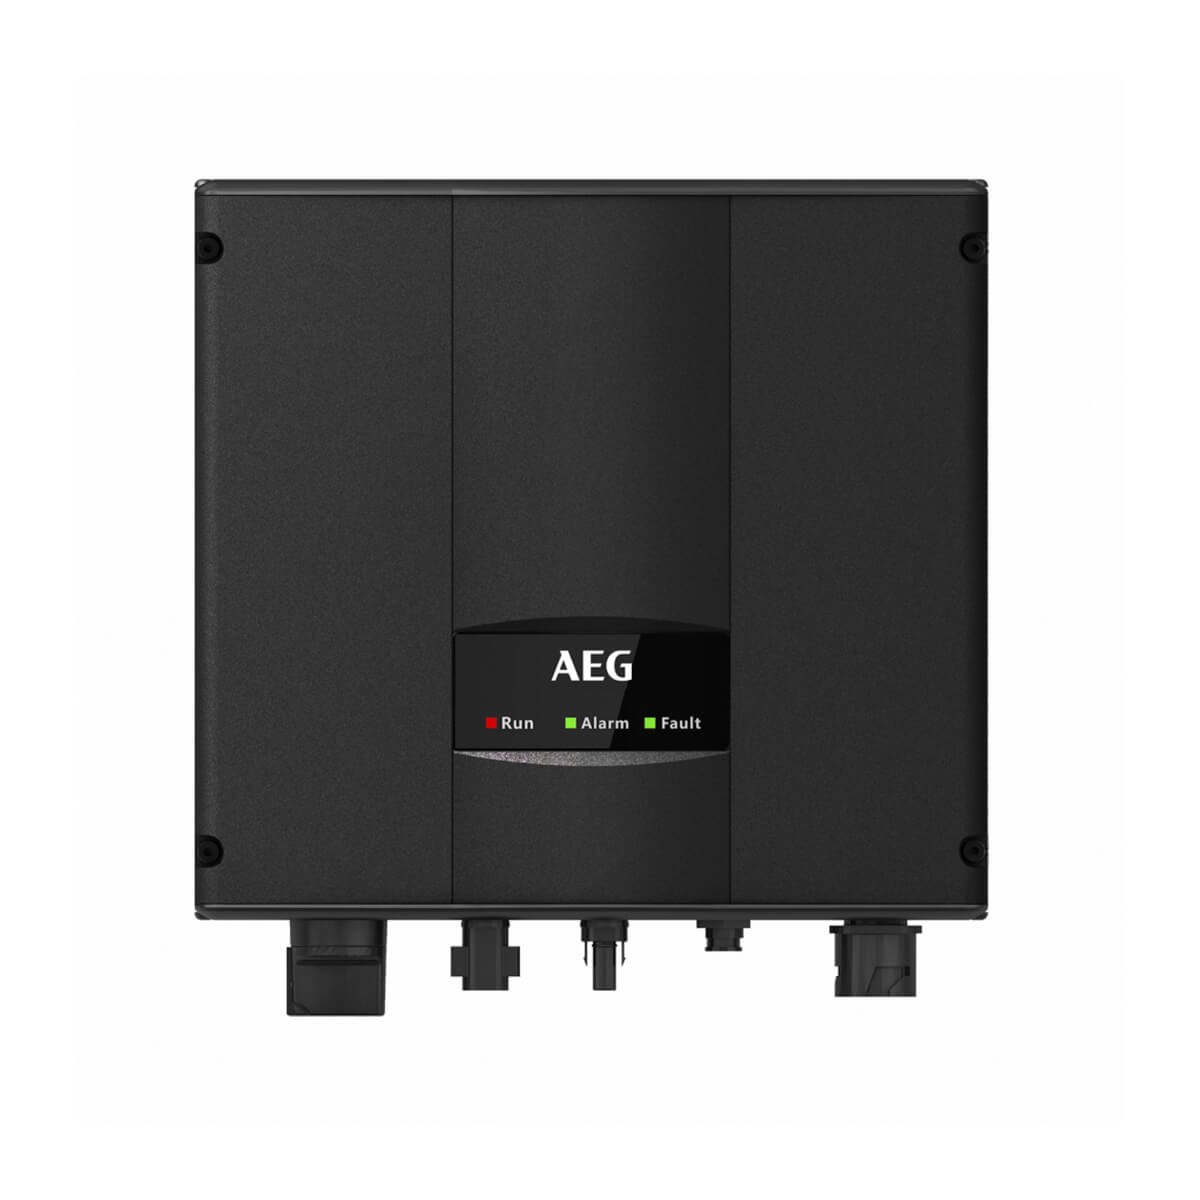 aeg 1kW inverter, aeg as-ir01 1kW inverter, aeg as-ir01-1000 inverter, aeg as-ir01-1000, aeg as-ir01 1kW, AEG 1 kW